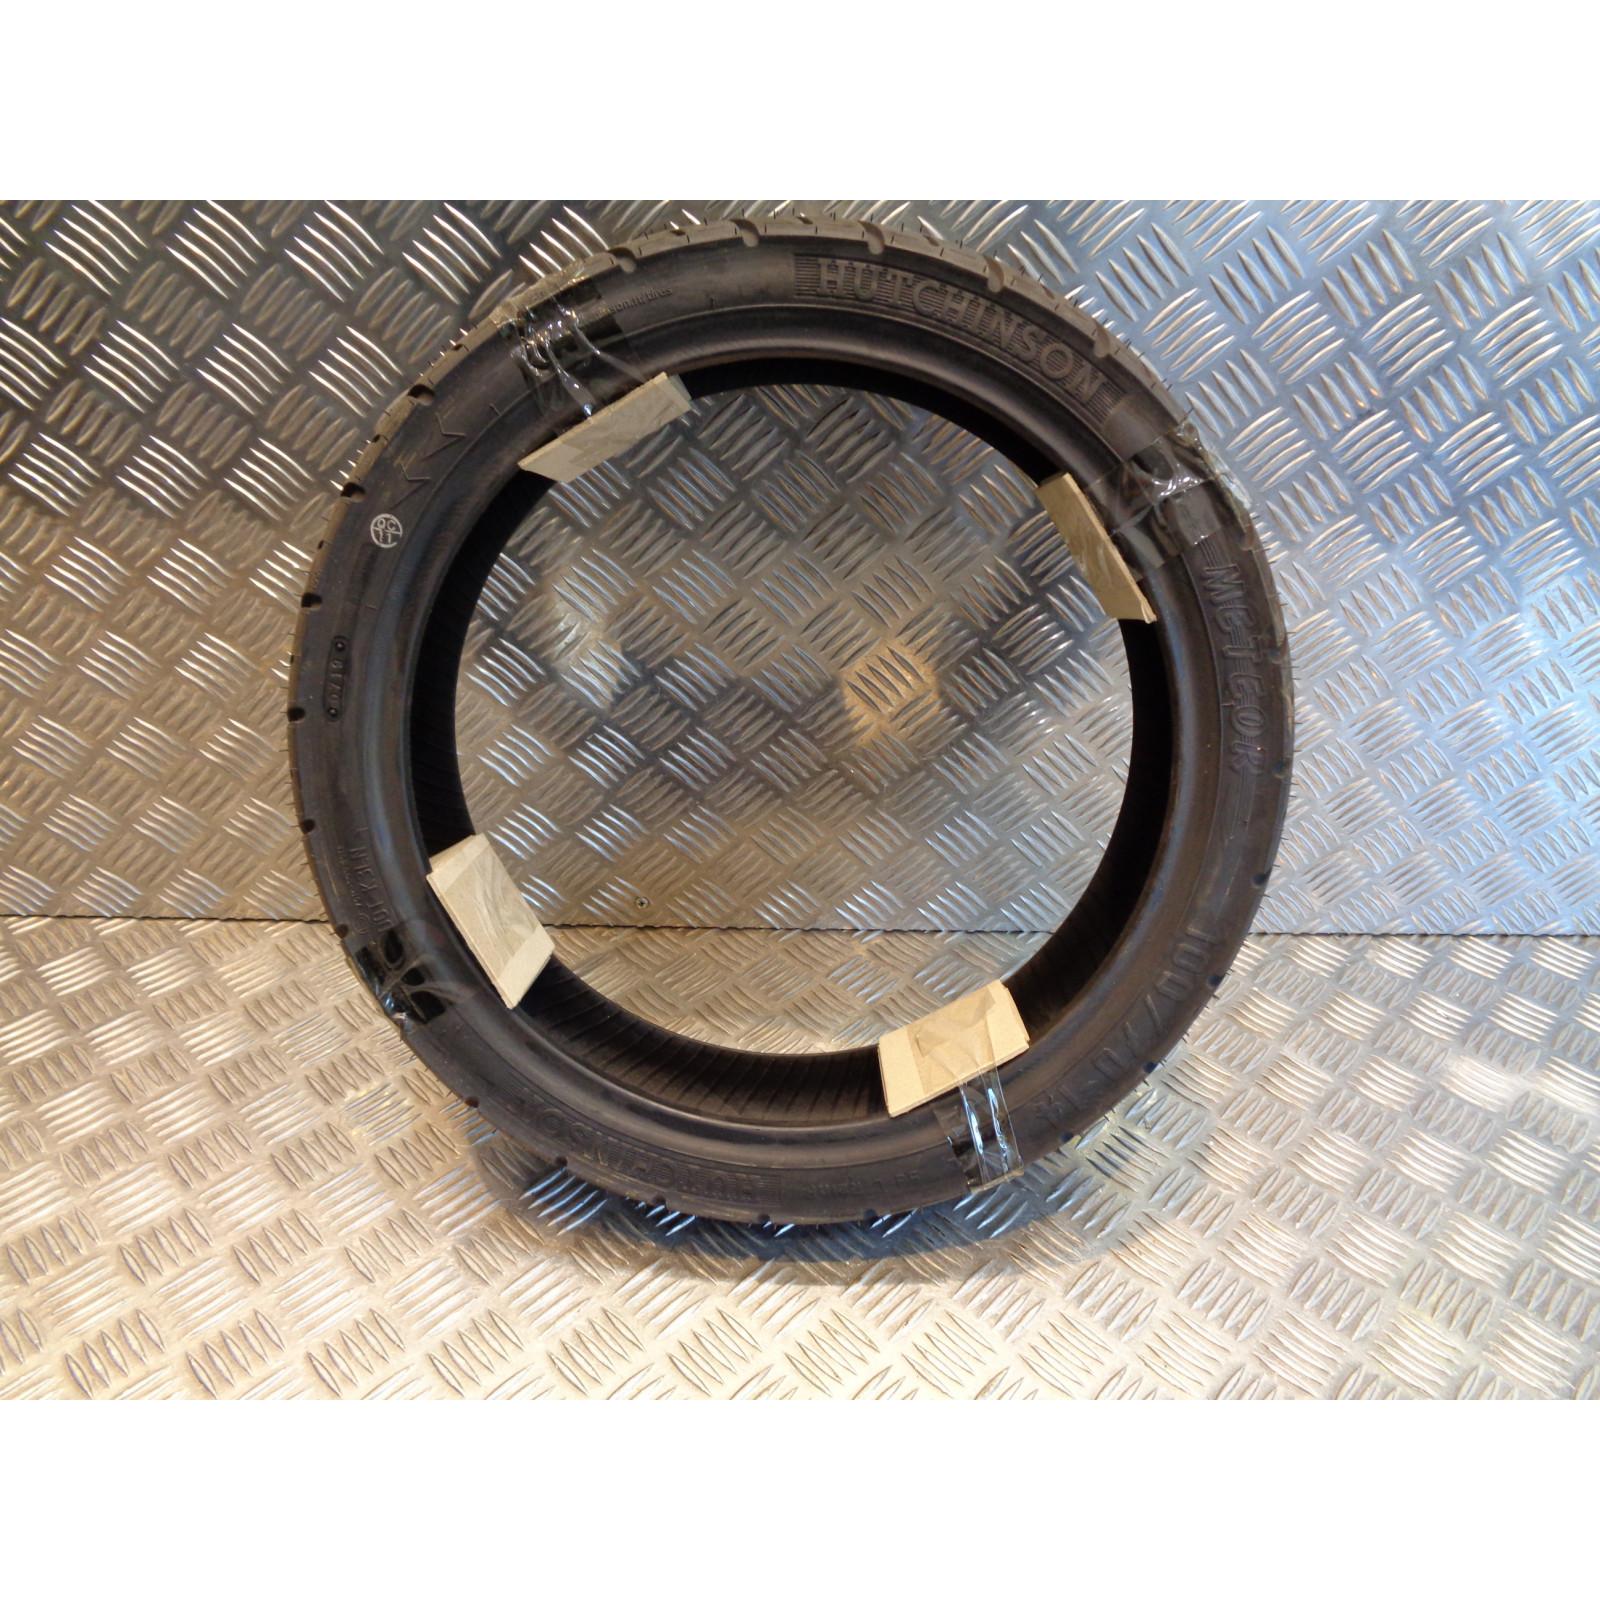 pneu scooter hutchinson meteor 100 / 70 - 14 m/c 53l reinf neuf